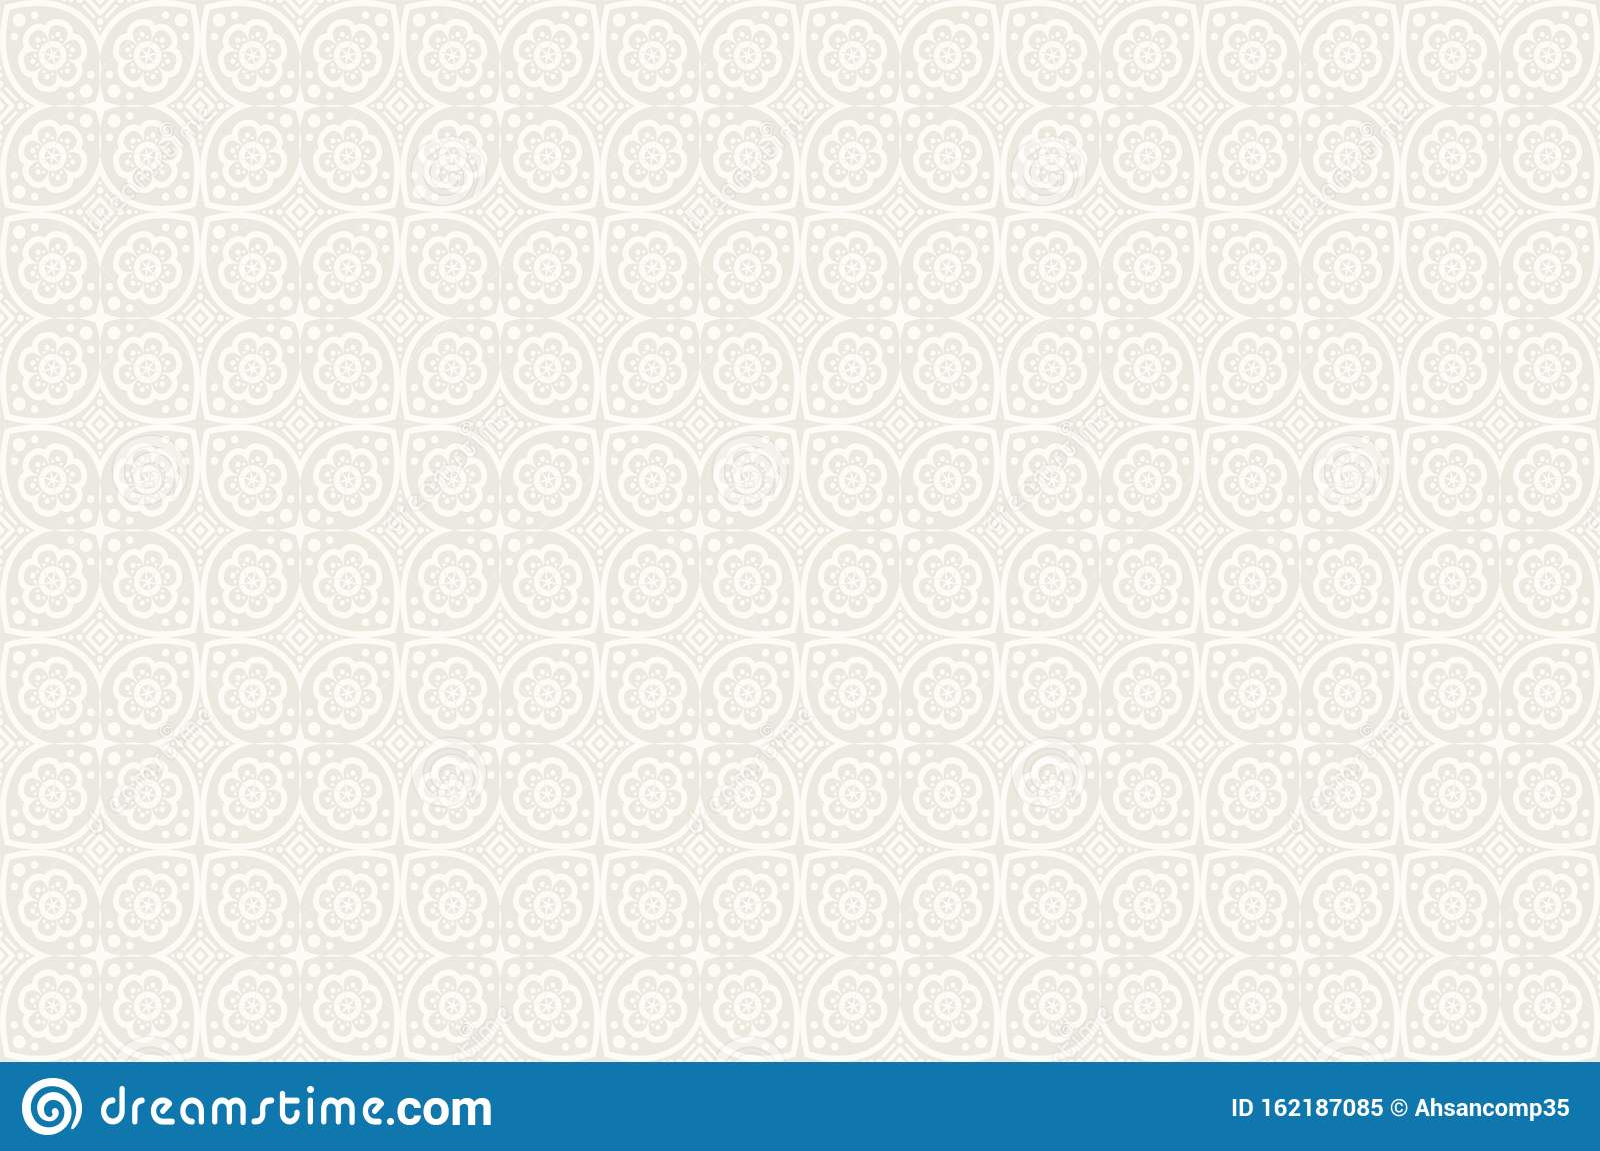 Wallpaper Batik Background, Pattern, Ornament, HD Stock Illustration -  Illustration Of Gradient, Concept: 162187085